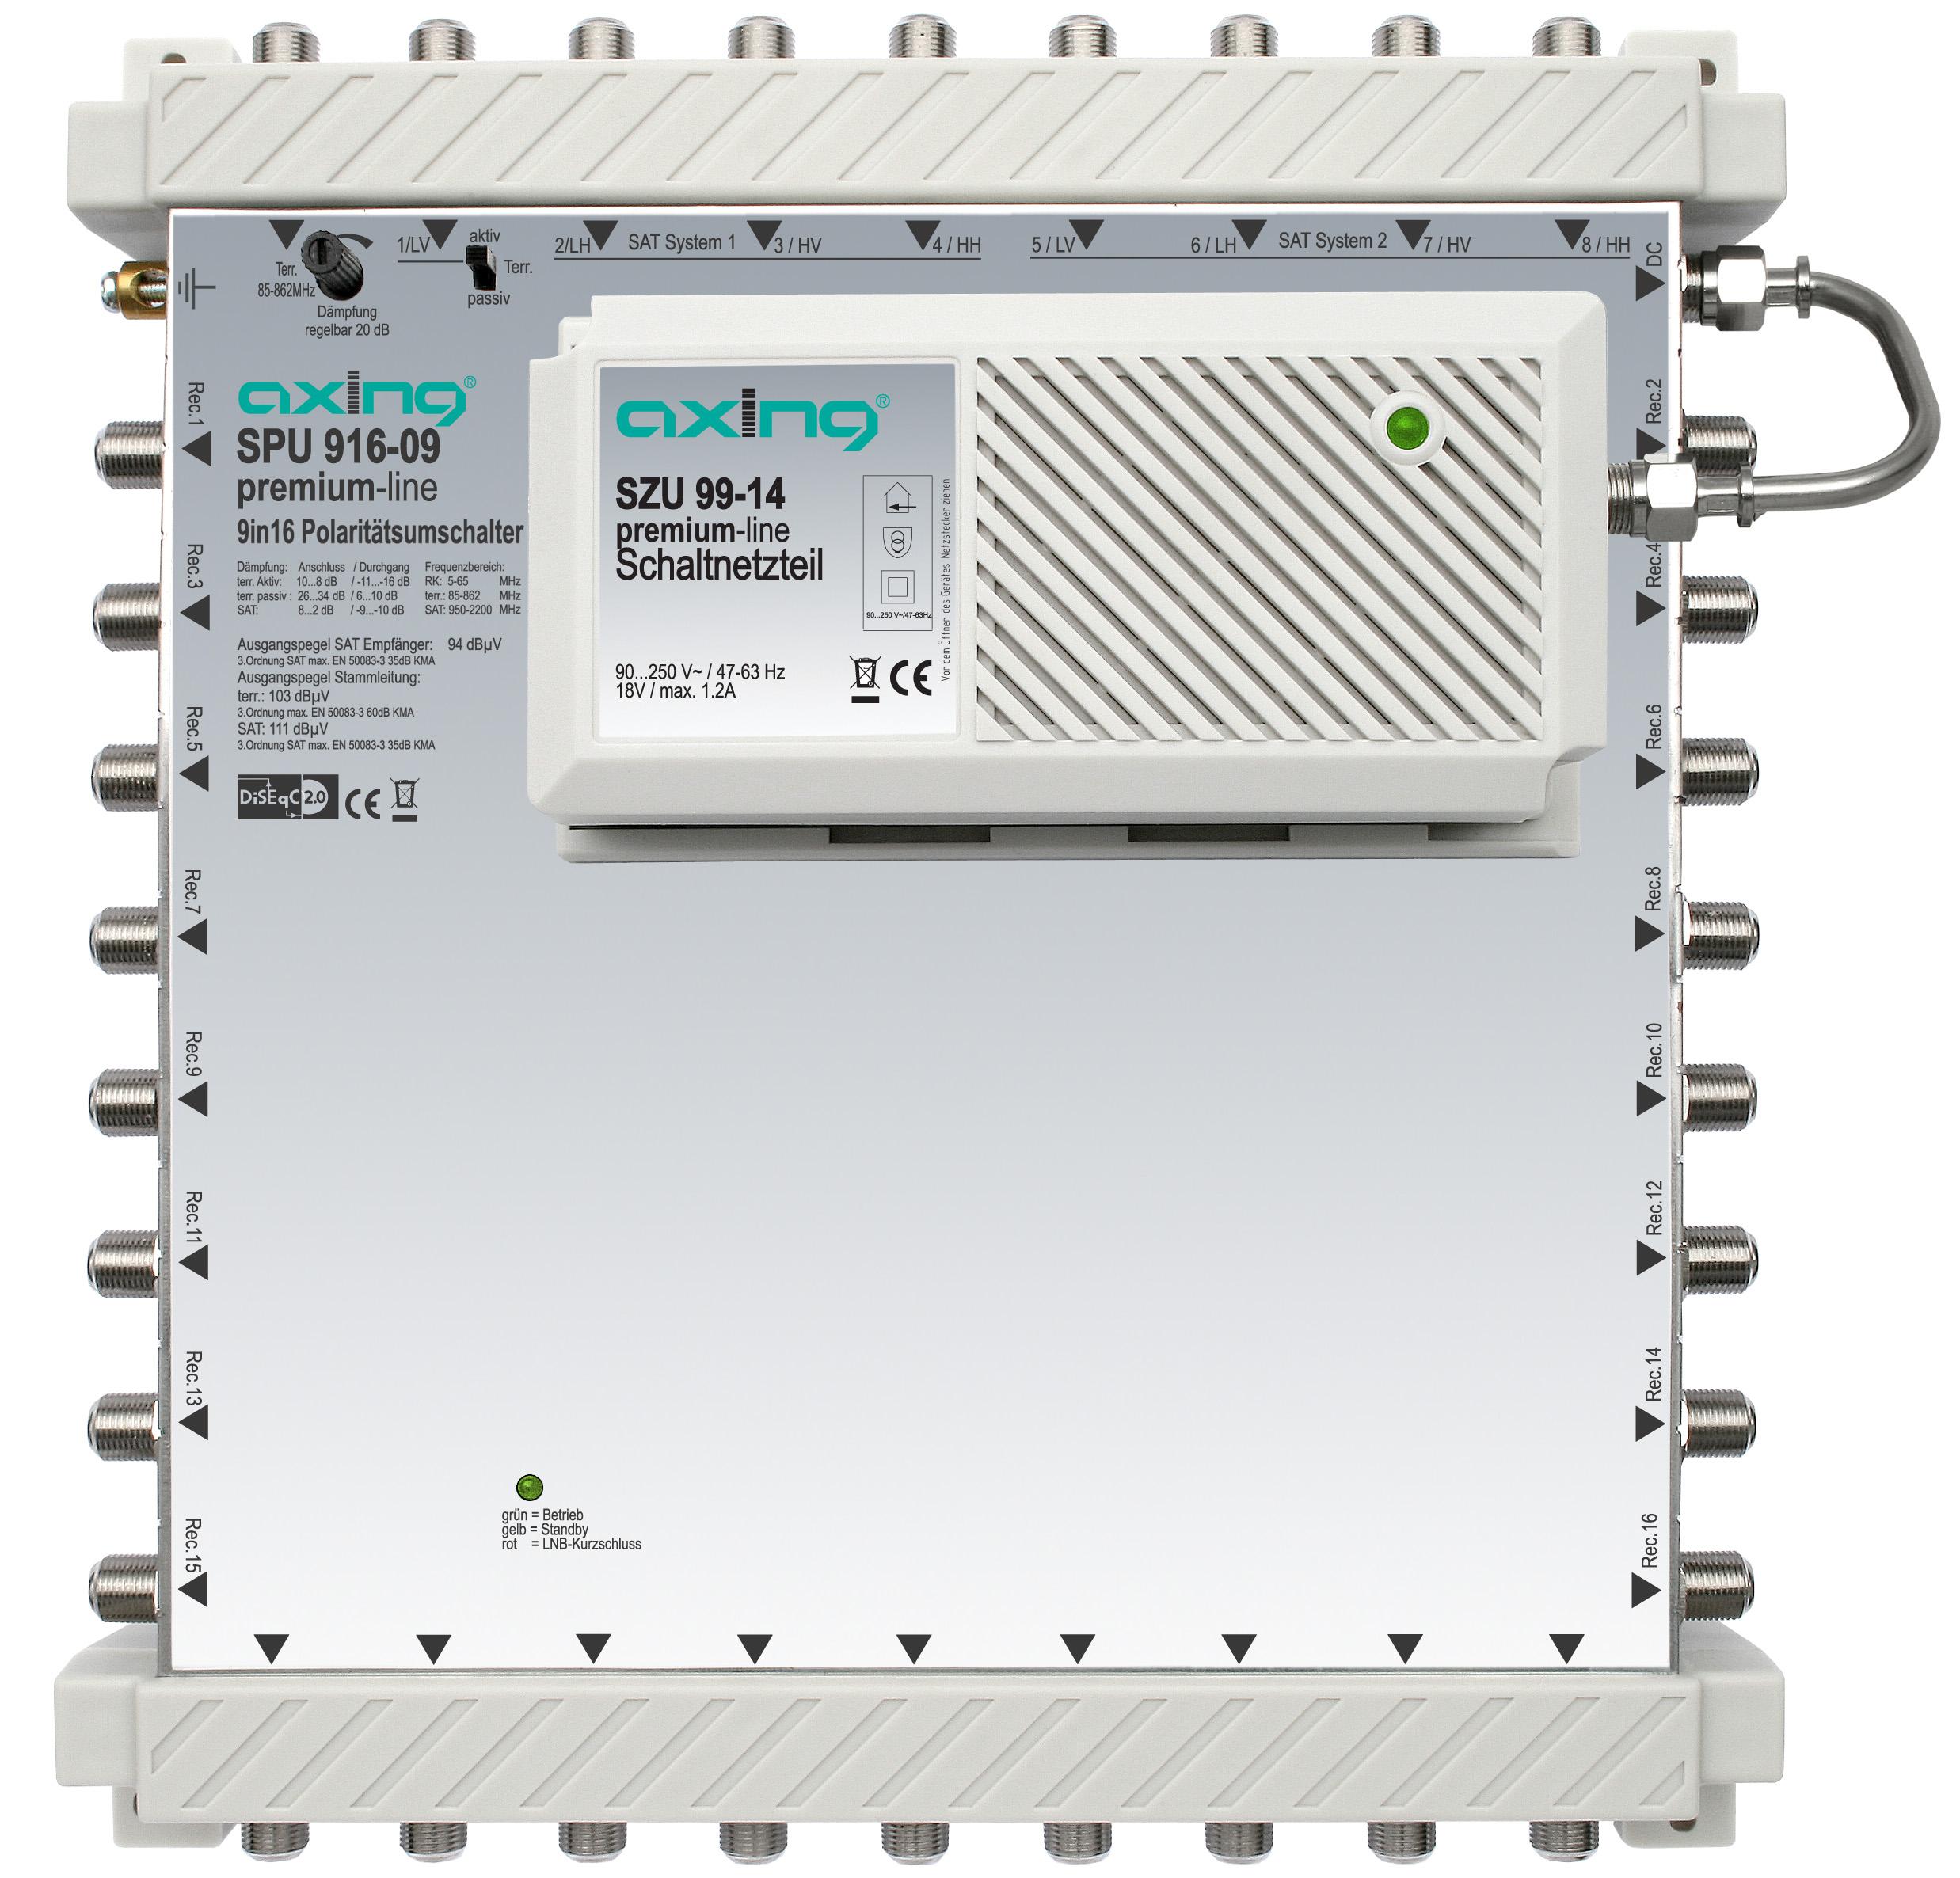 1 Stk SAT Multischalter  9 in 16, kaskadierbar, SPU 916-09 HSATS916KA